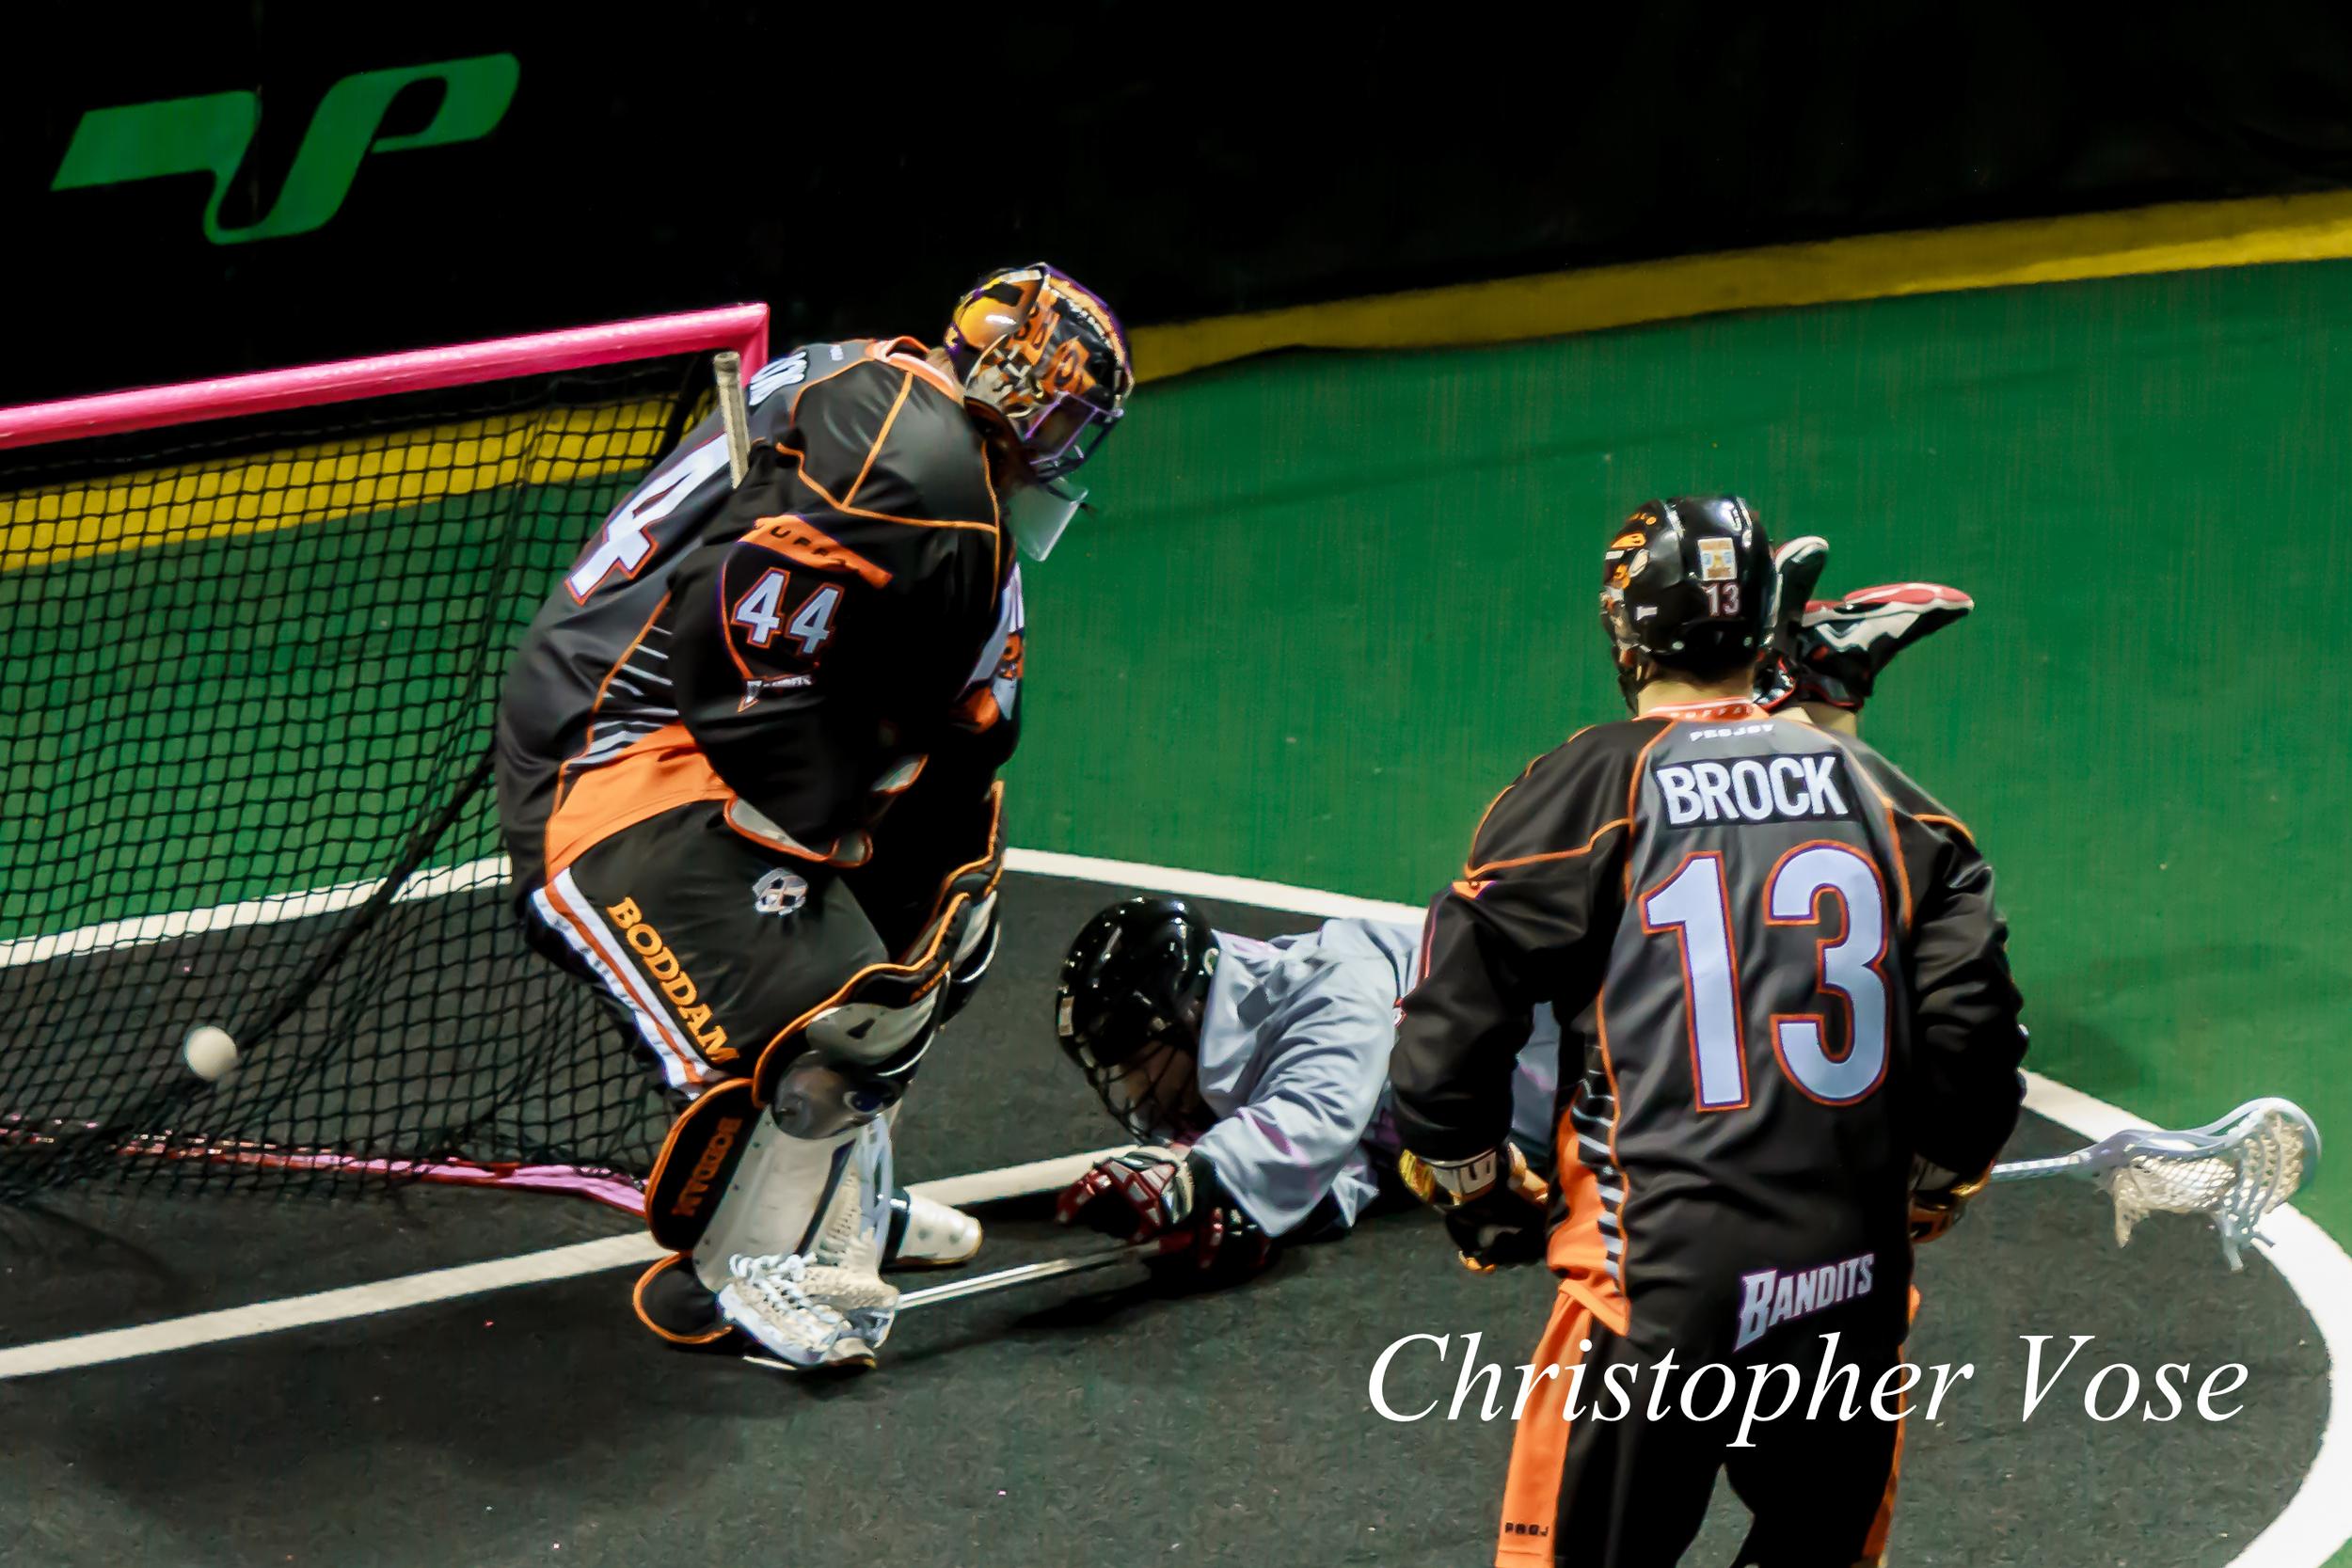 2014-03-29 Jamie Lincoln Goal.jpg